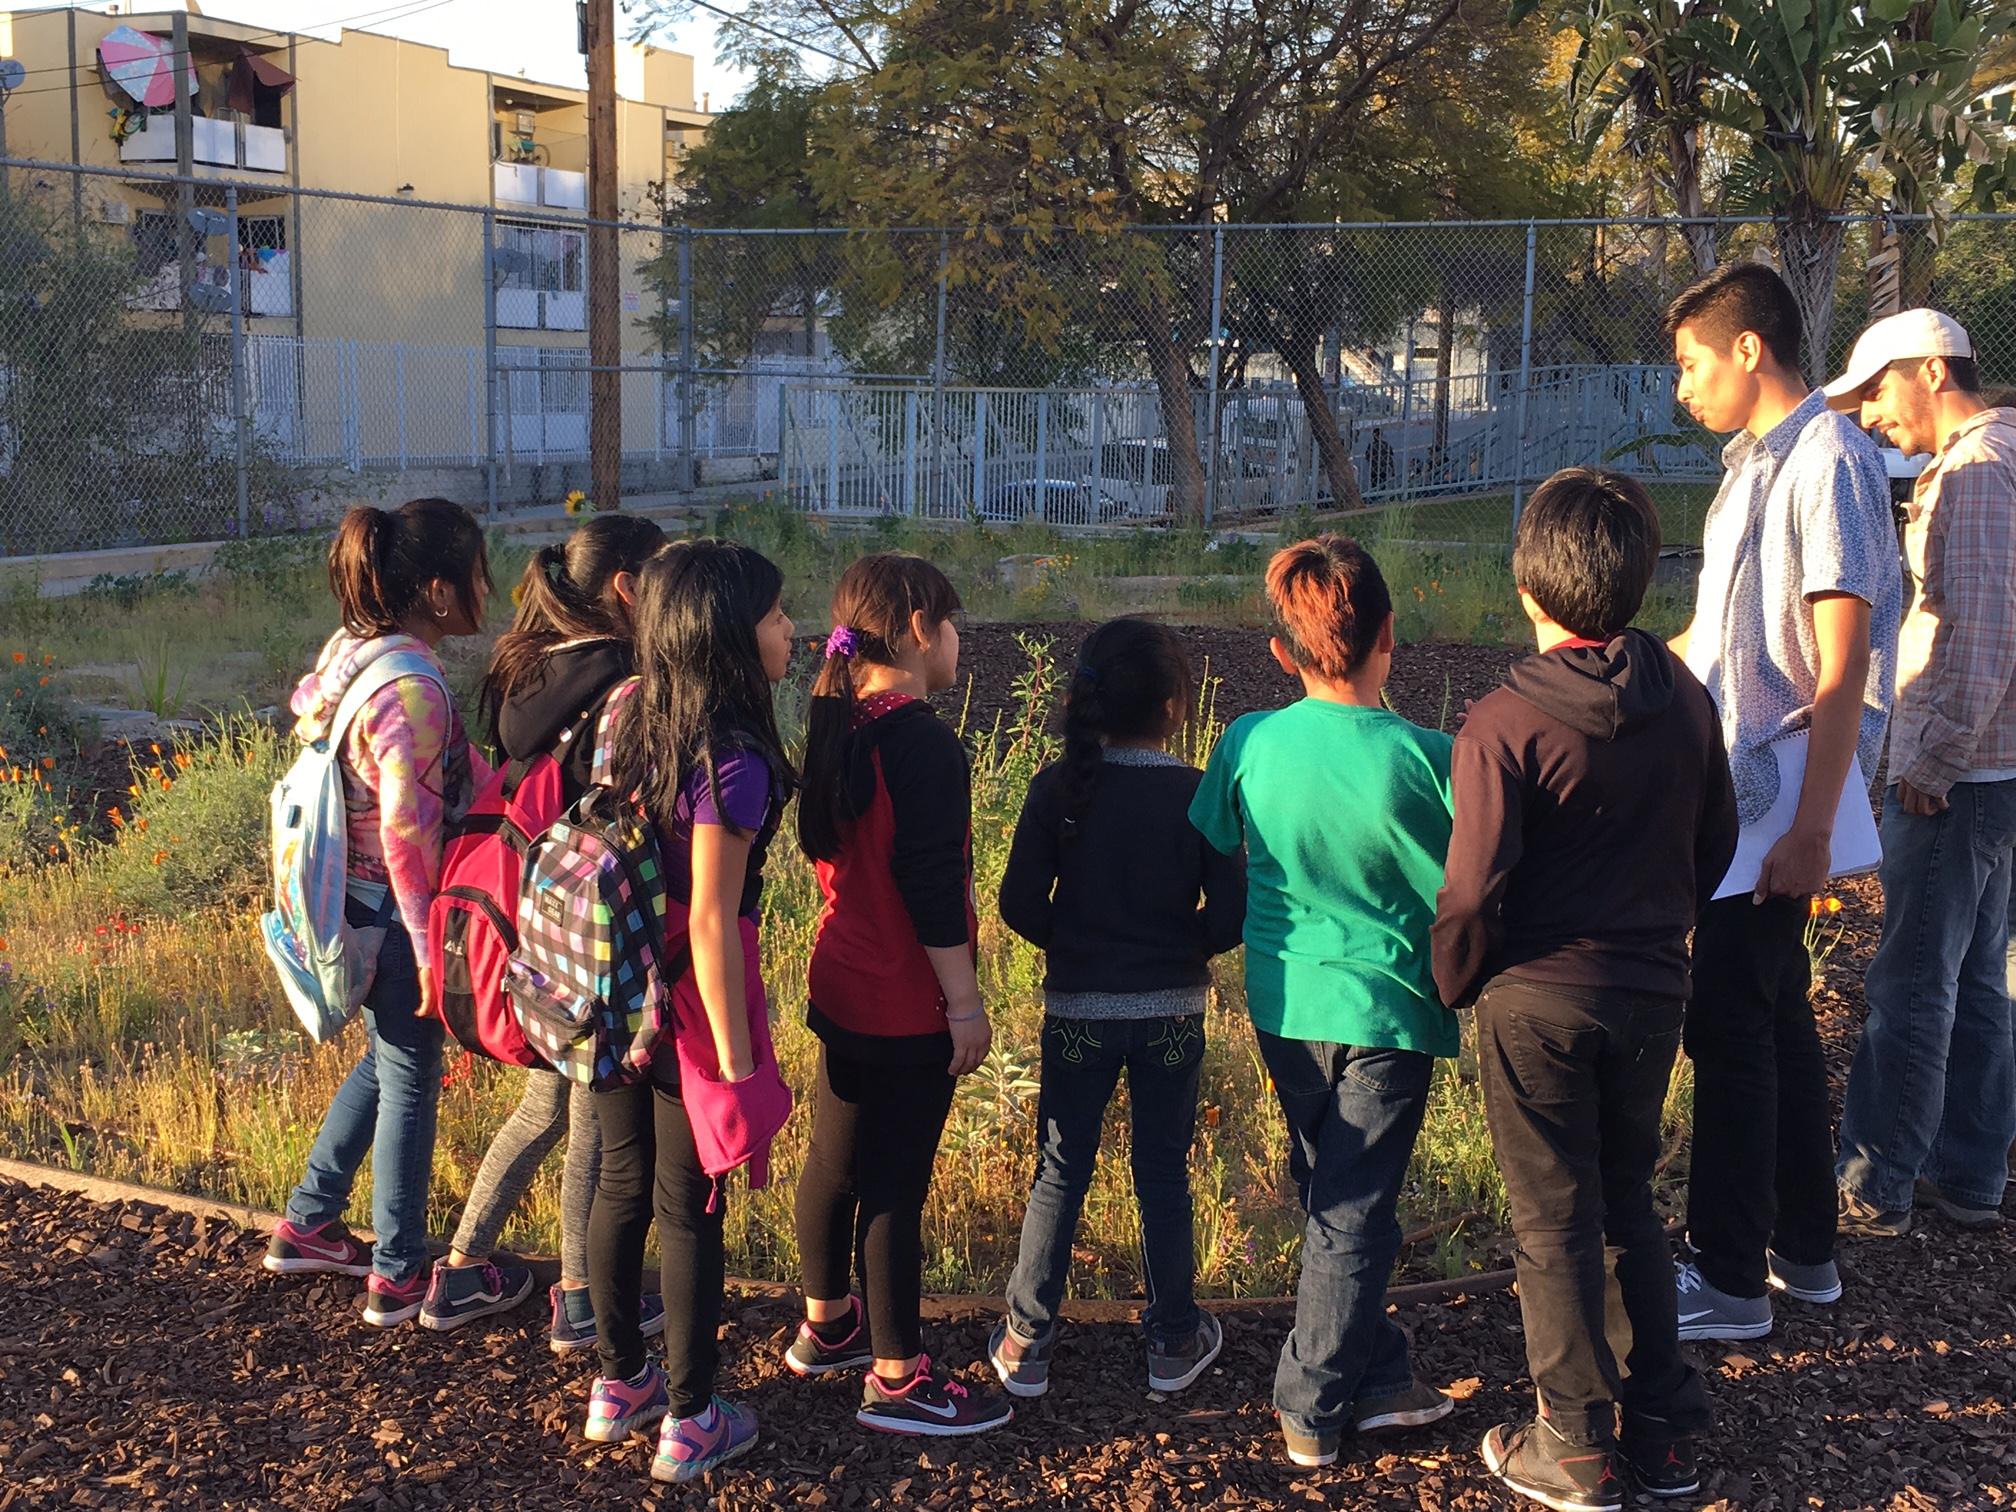 Schoolyard Habitat - A collaborative effort between Los Angeles Audubon Society College Fellows, restoration ecologists, ELP students, and community volunteers implement schoolyard habitats at urban core schools near downtown Los Angeles.